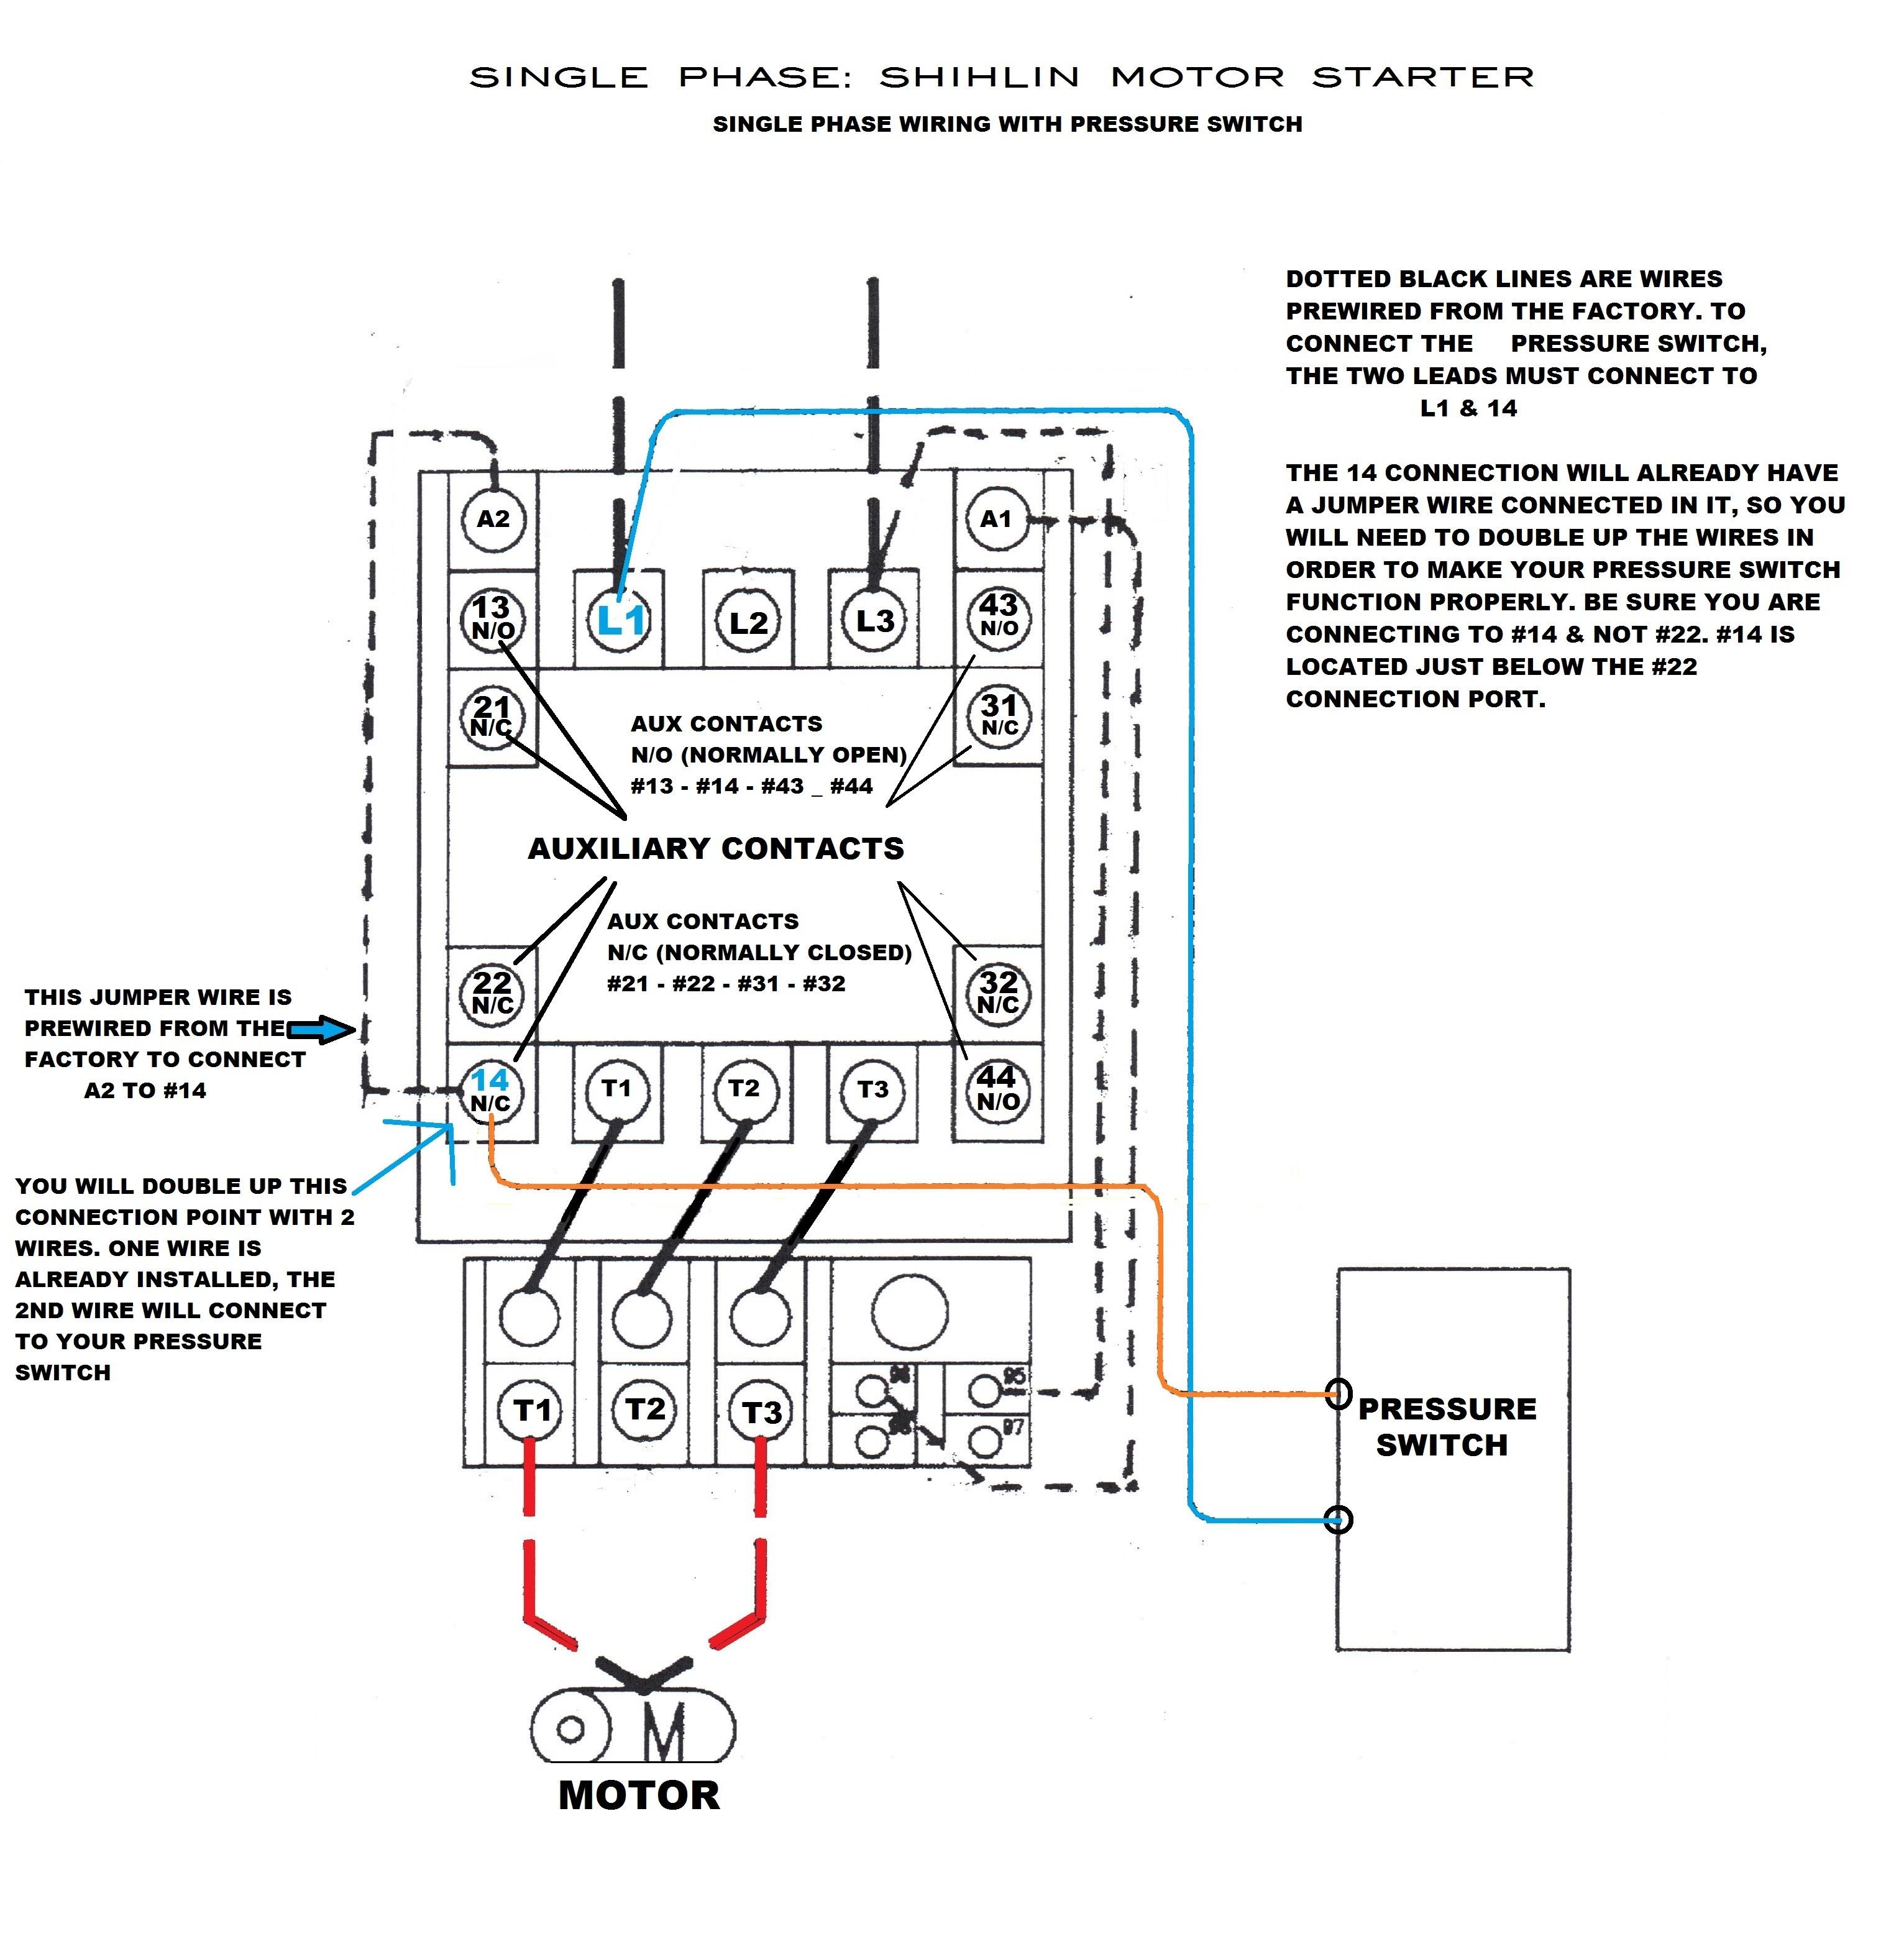 allen bradley motor starter wiring diagram Download-Allen Bradley Motor Starter Wiring Diagram Inspirational Fine Allen Bradley Motor Control Wiring Diagrams 6-e